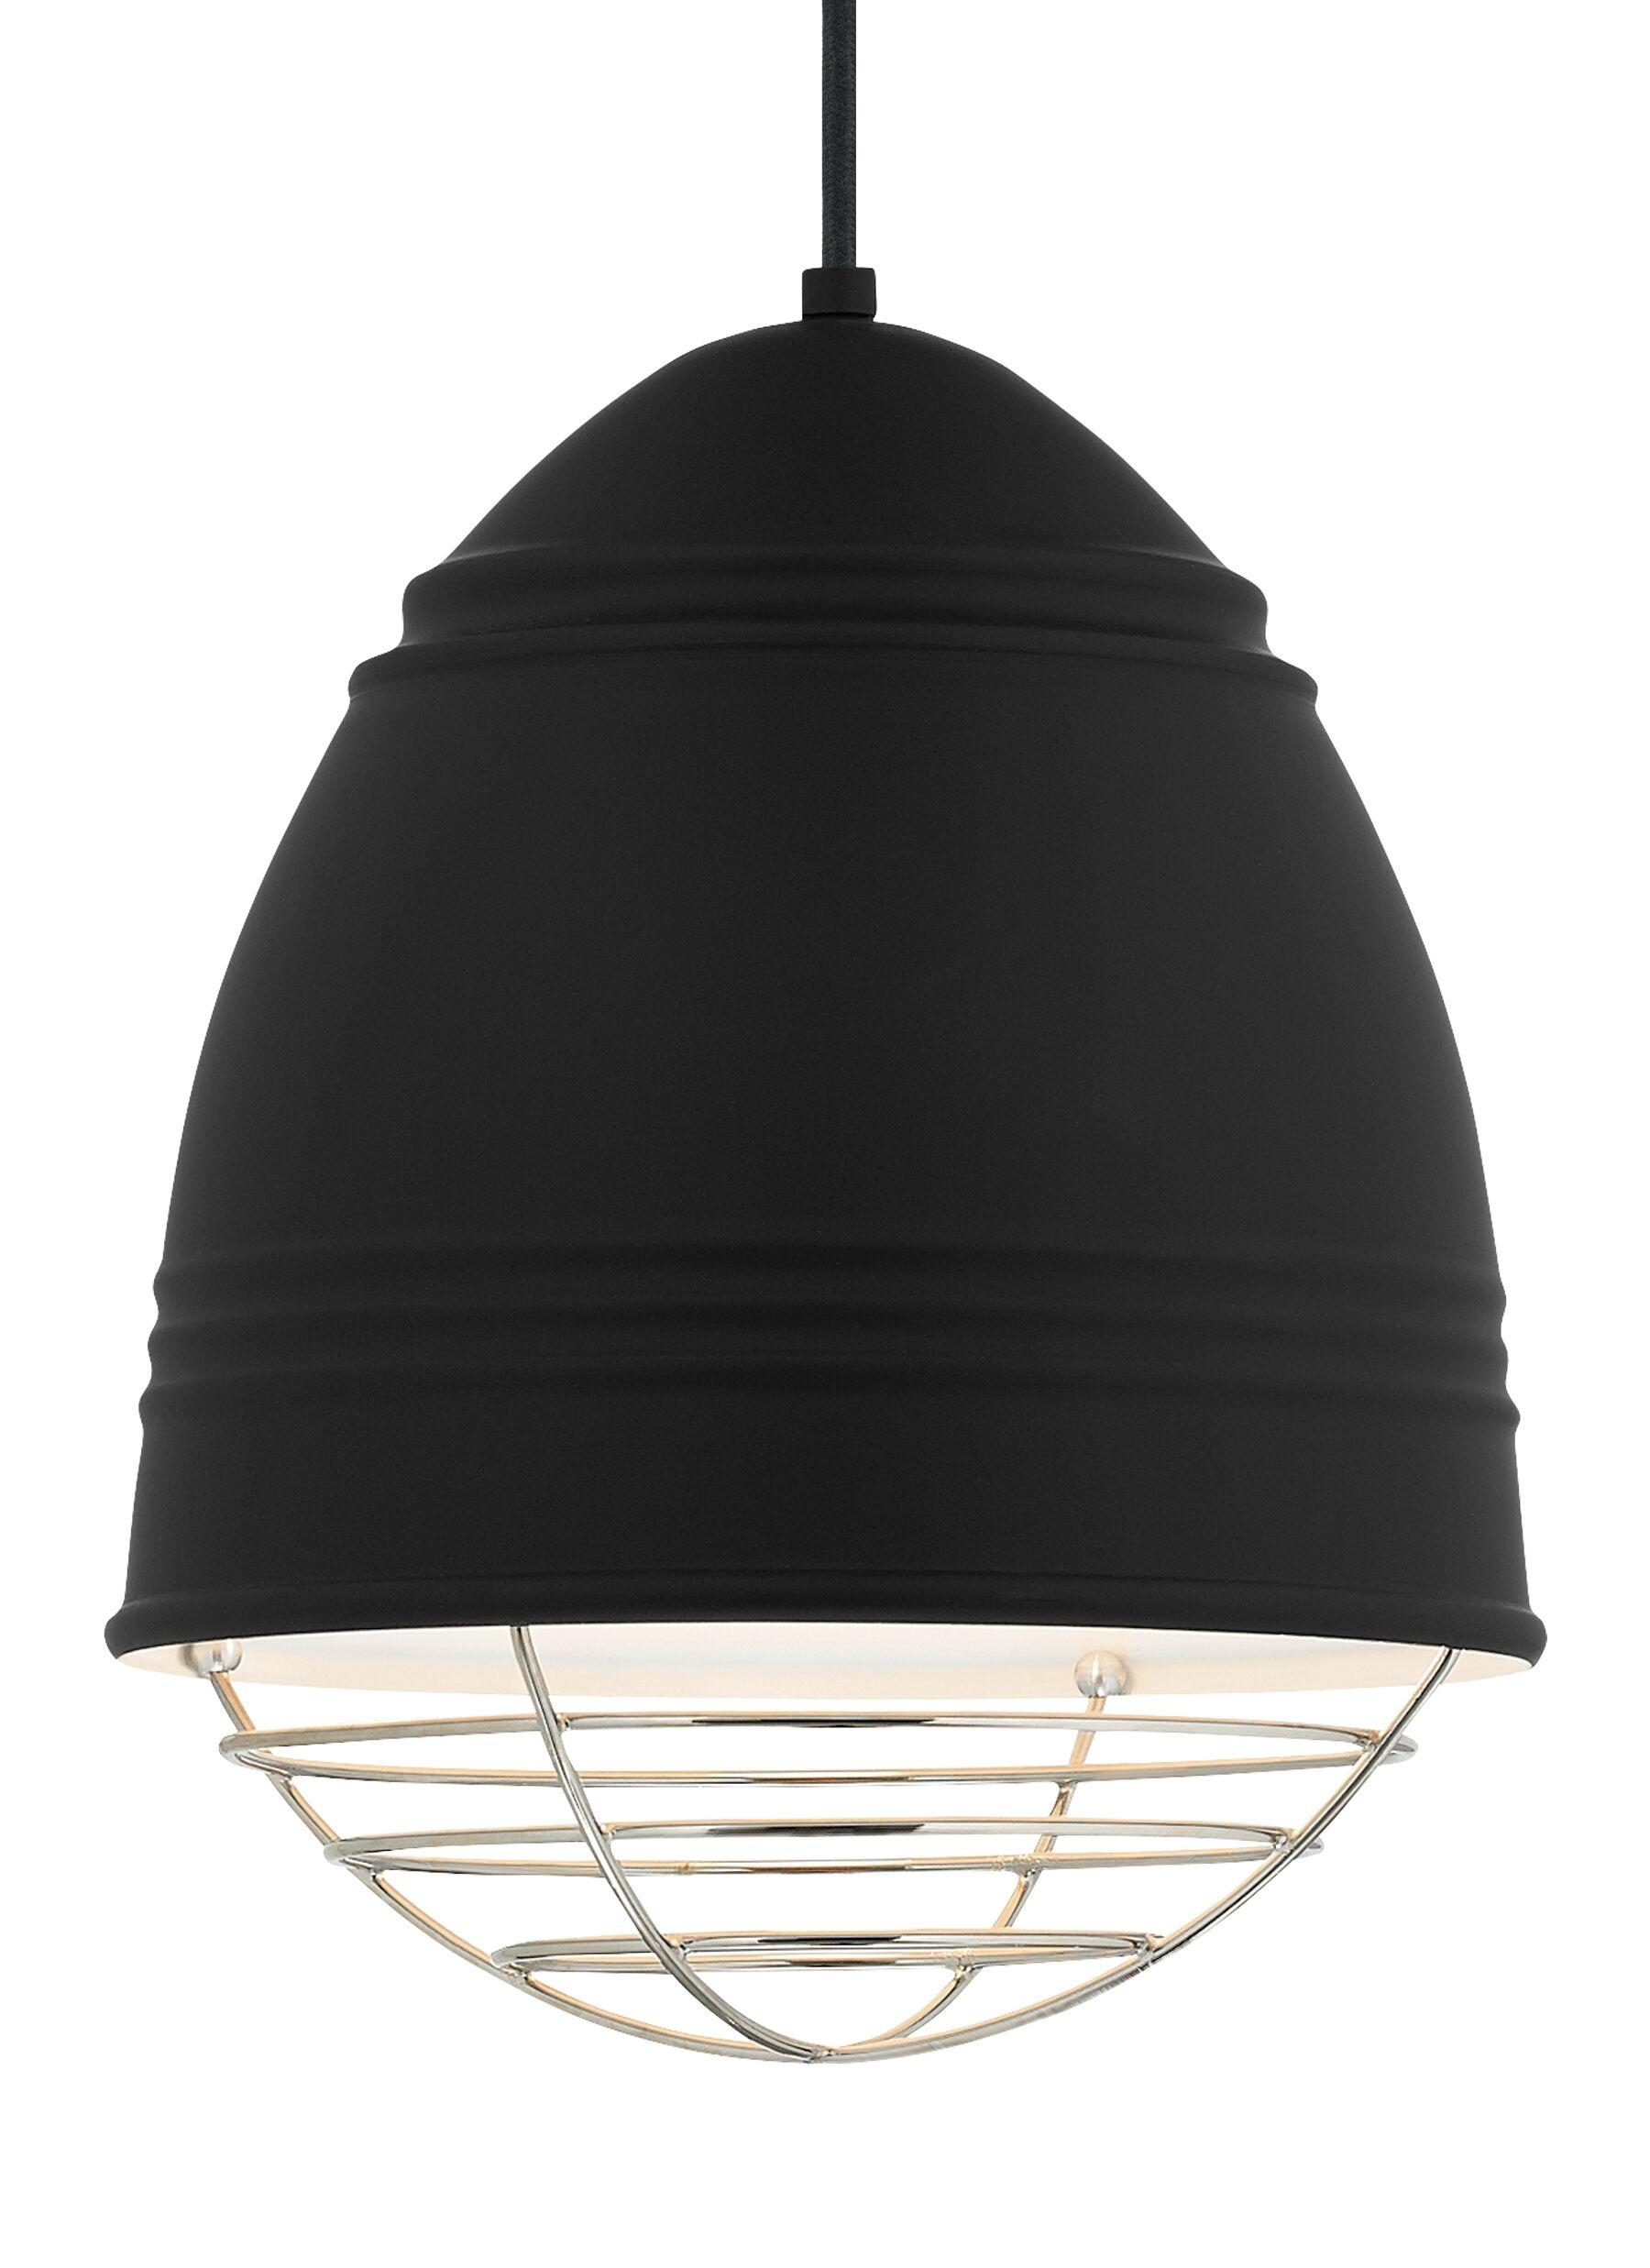 Else 1-Light Bell Pendant Finish: Polished Nickel, Shade Color: Rubberized Black/White Interior